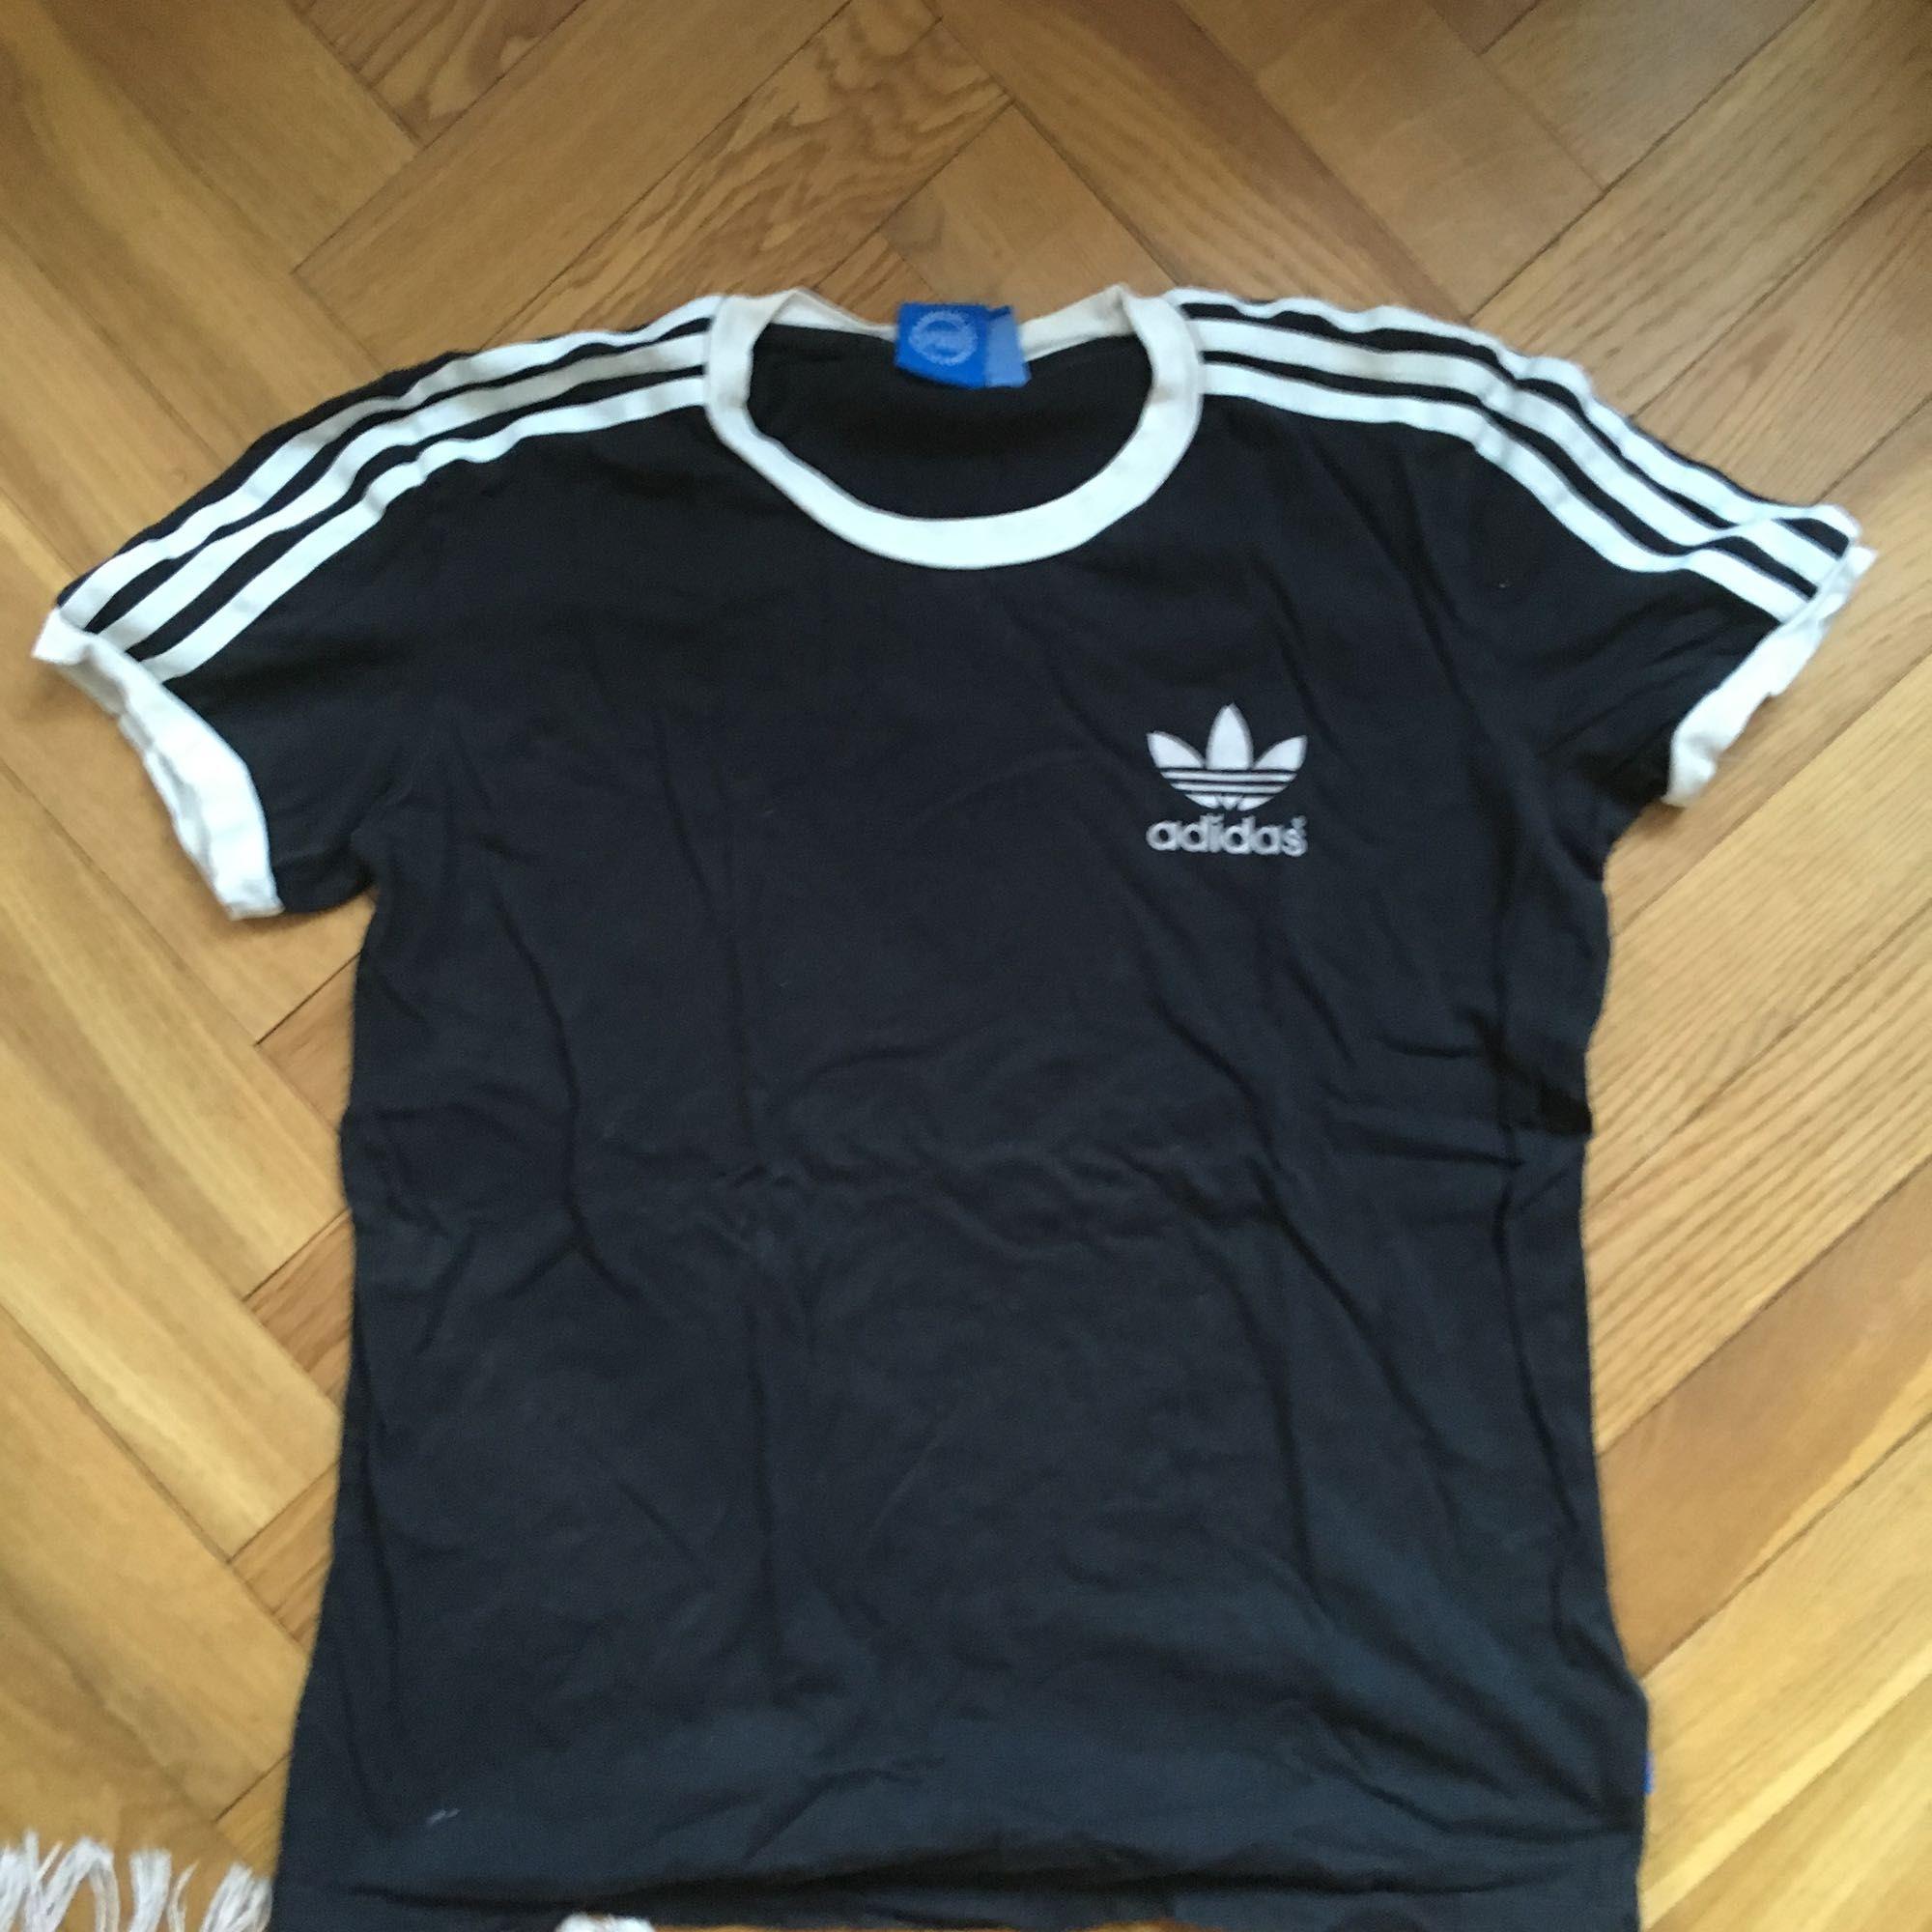 Tshirt från Adidas! . T-shirts.